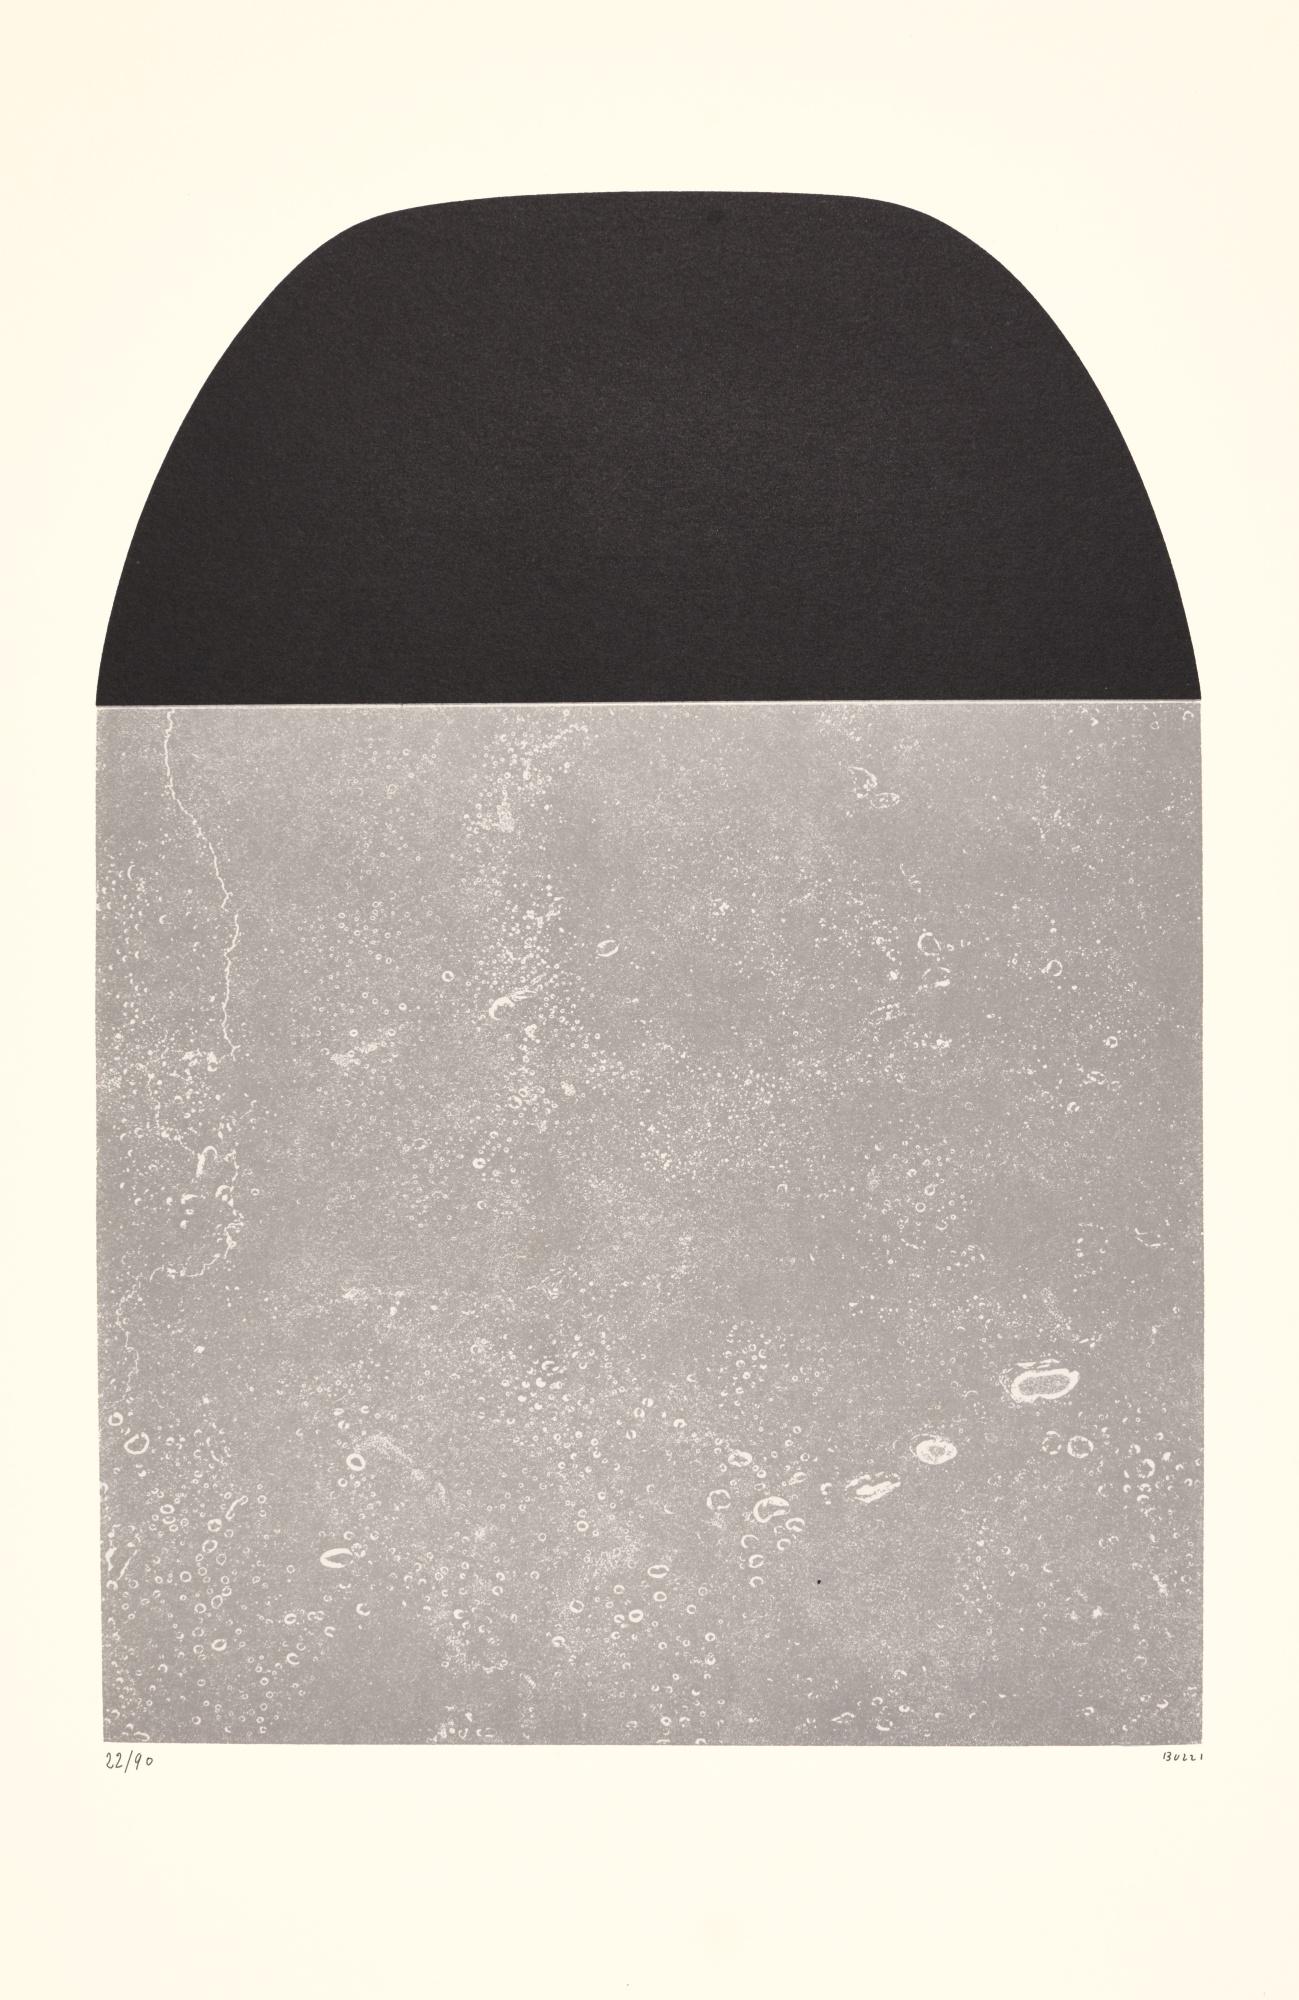 Alberto Burri-Untitled (Trittico) (Calvesi 63-65)-1975